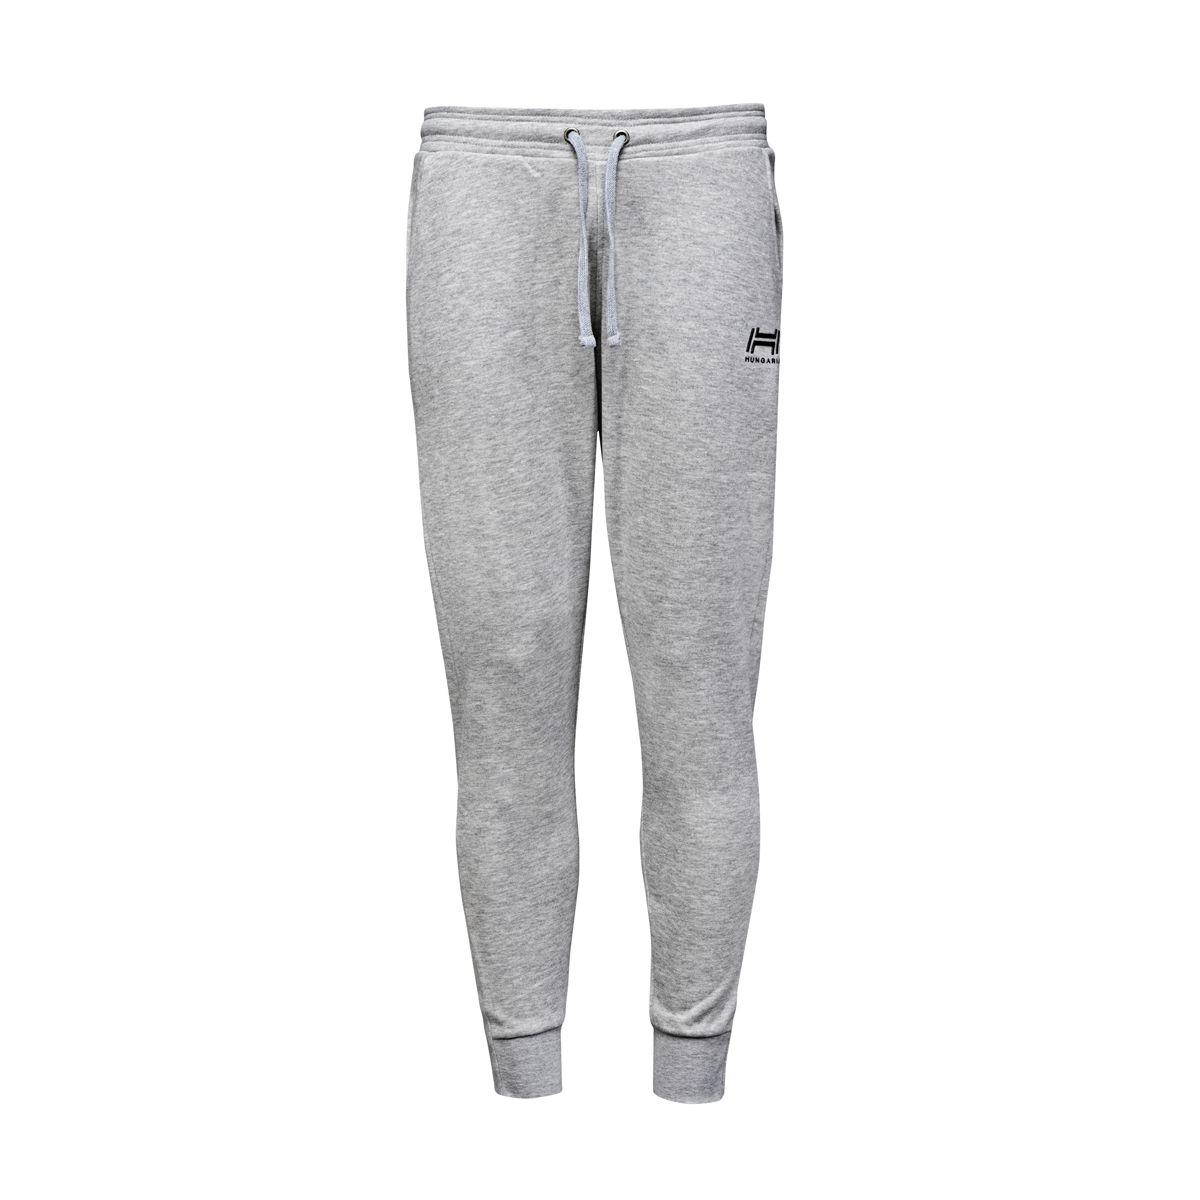 Pantalon  Coton Homme Jogging Kohoutek Mixte